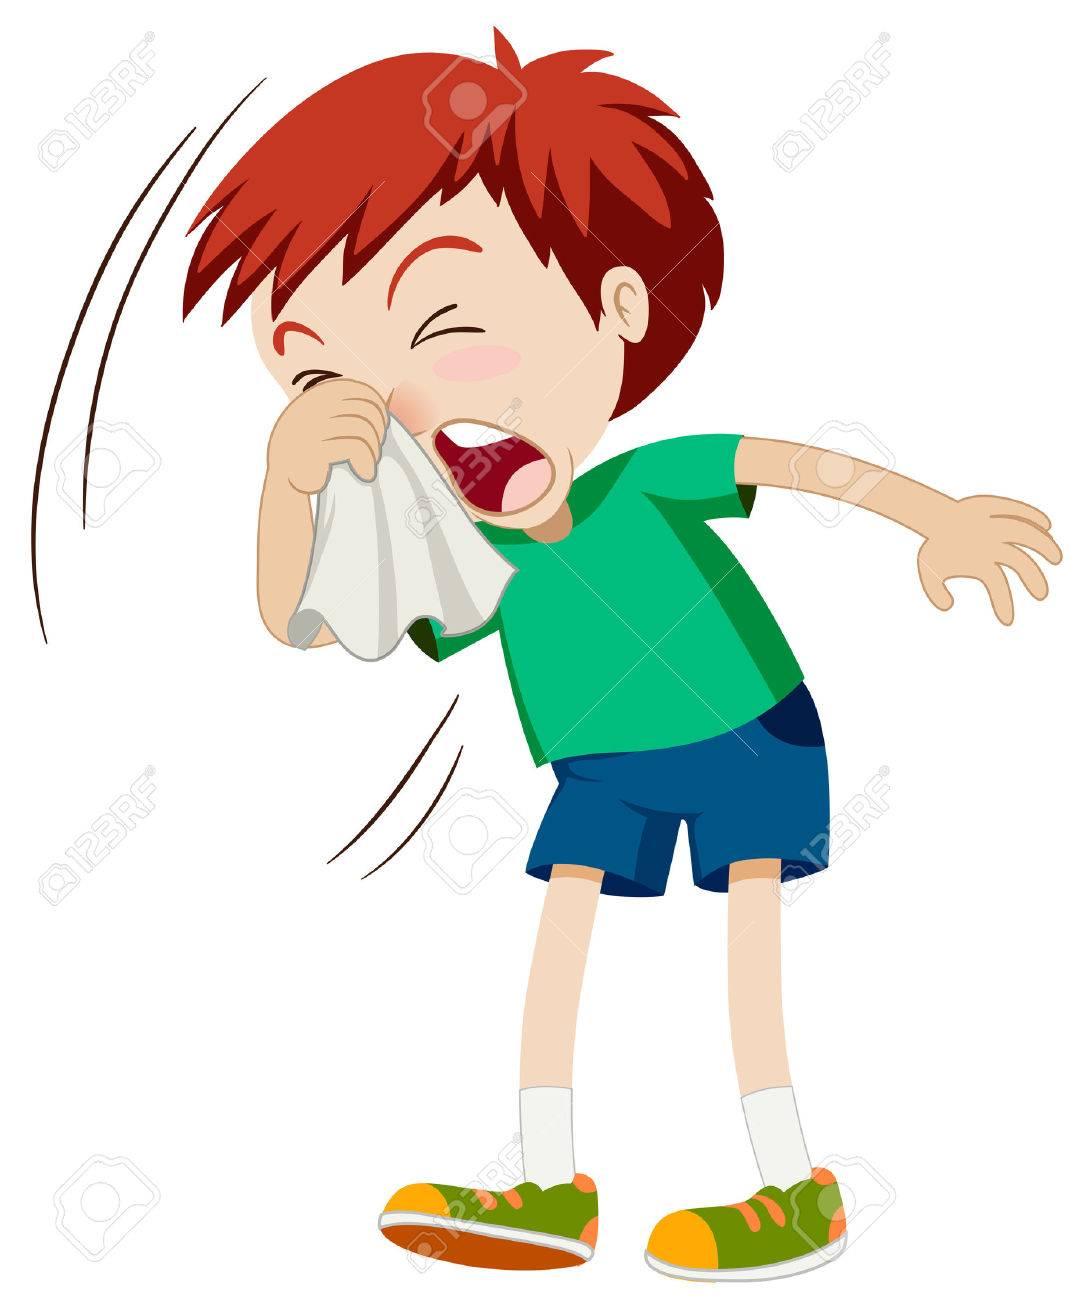 Little boy sneezing hard illustration - 53197380